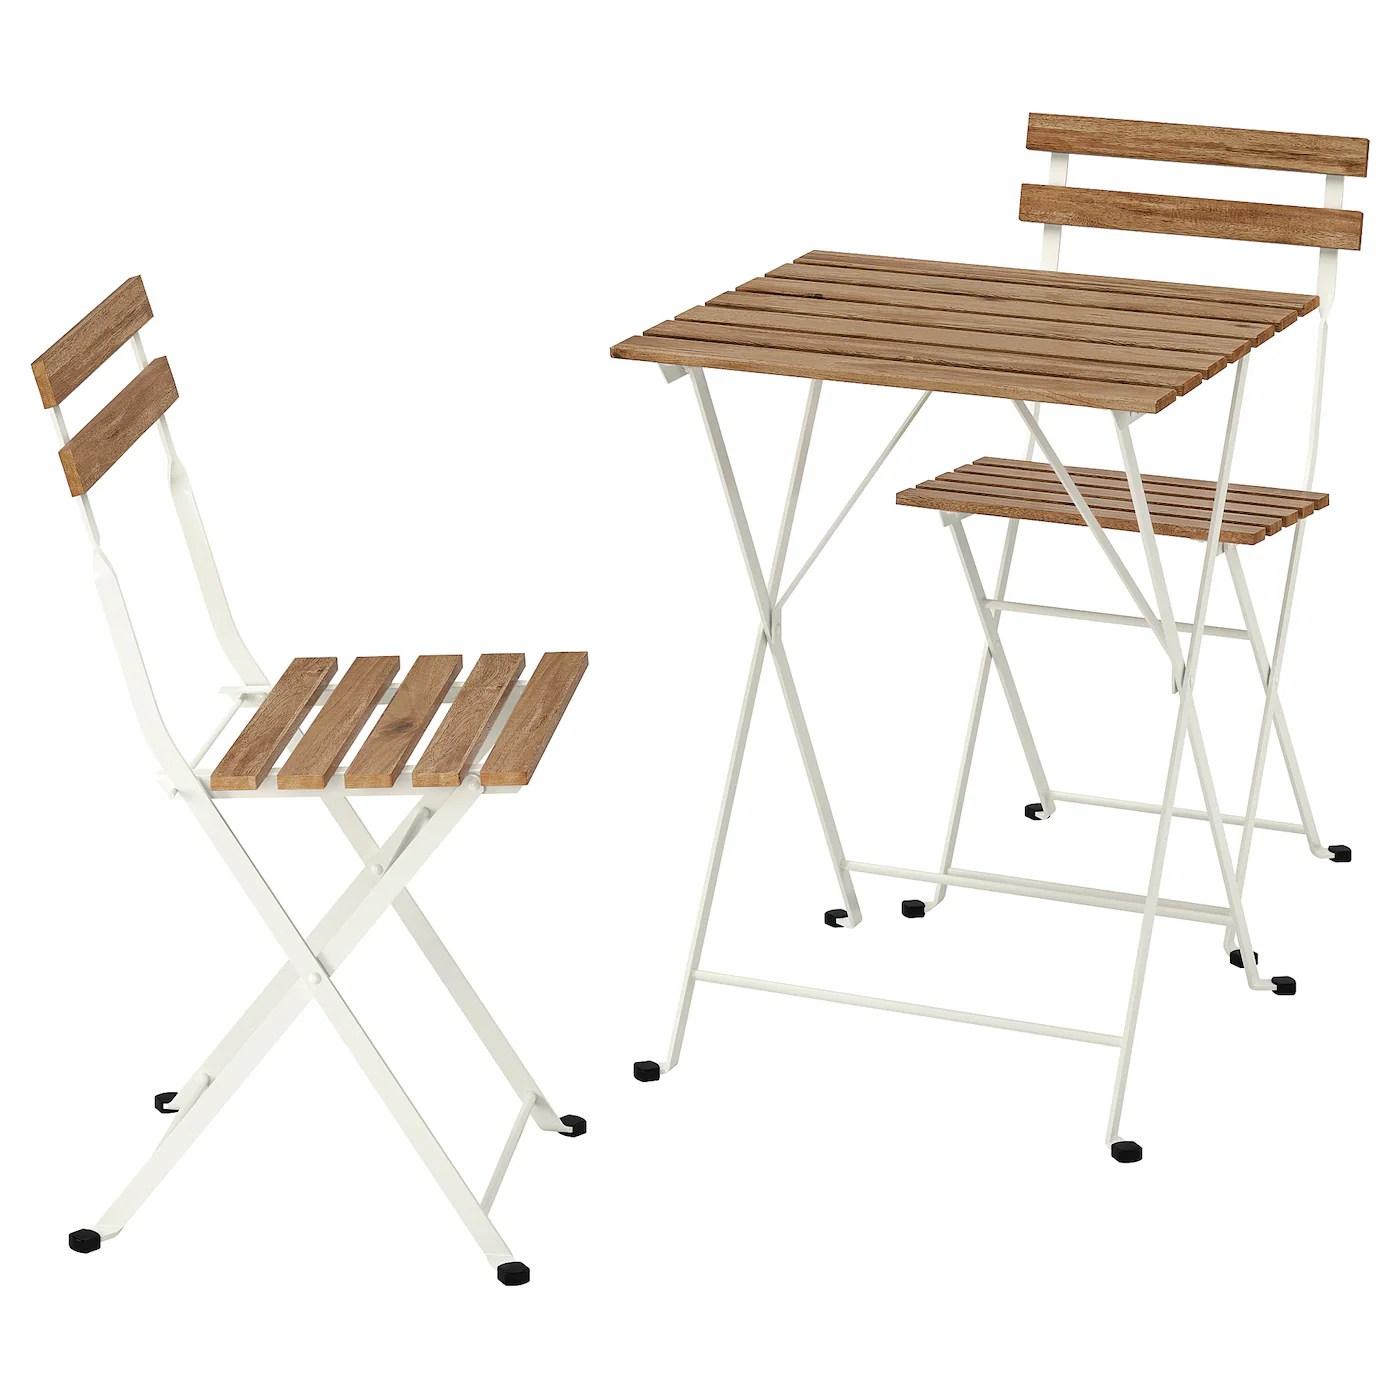 Ferte tavoli se 720609 e da ikea pieghevole tavolo giardino. Set Da Giardino Tavoli E Sedie Da Esterno Ikea It